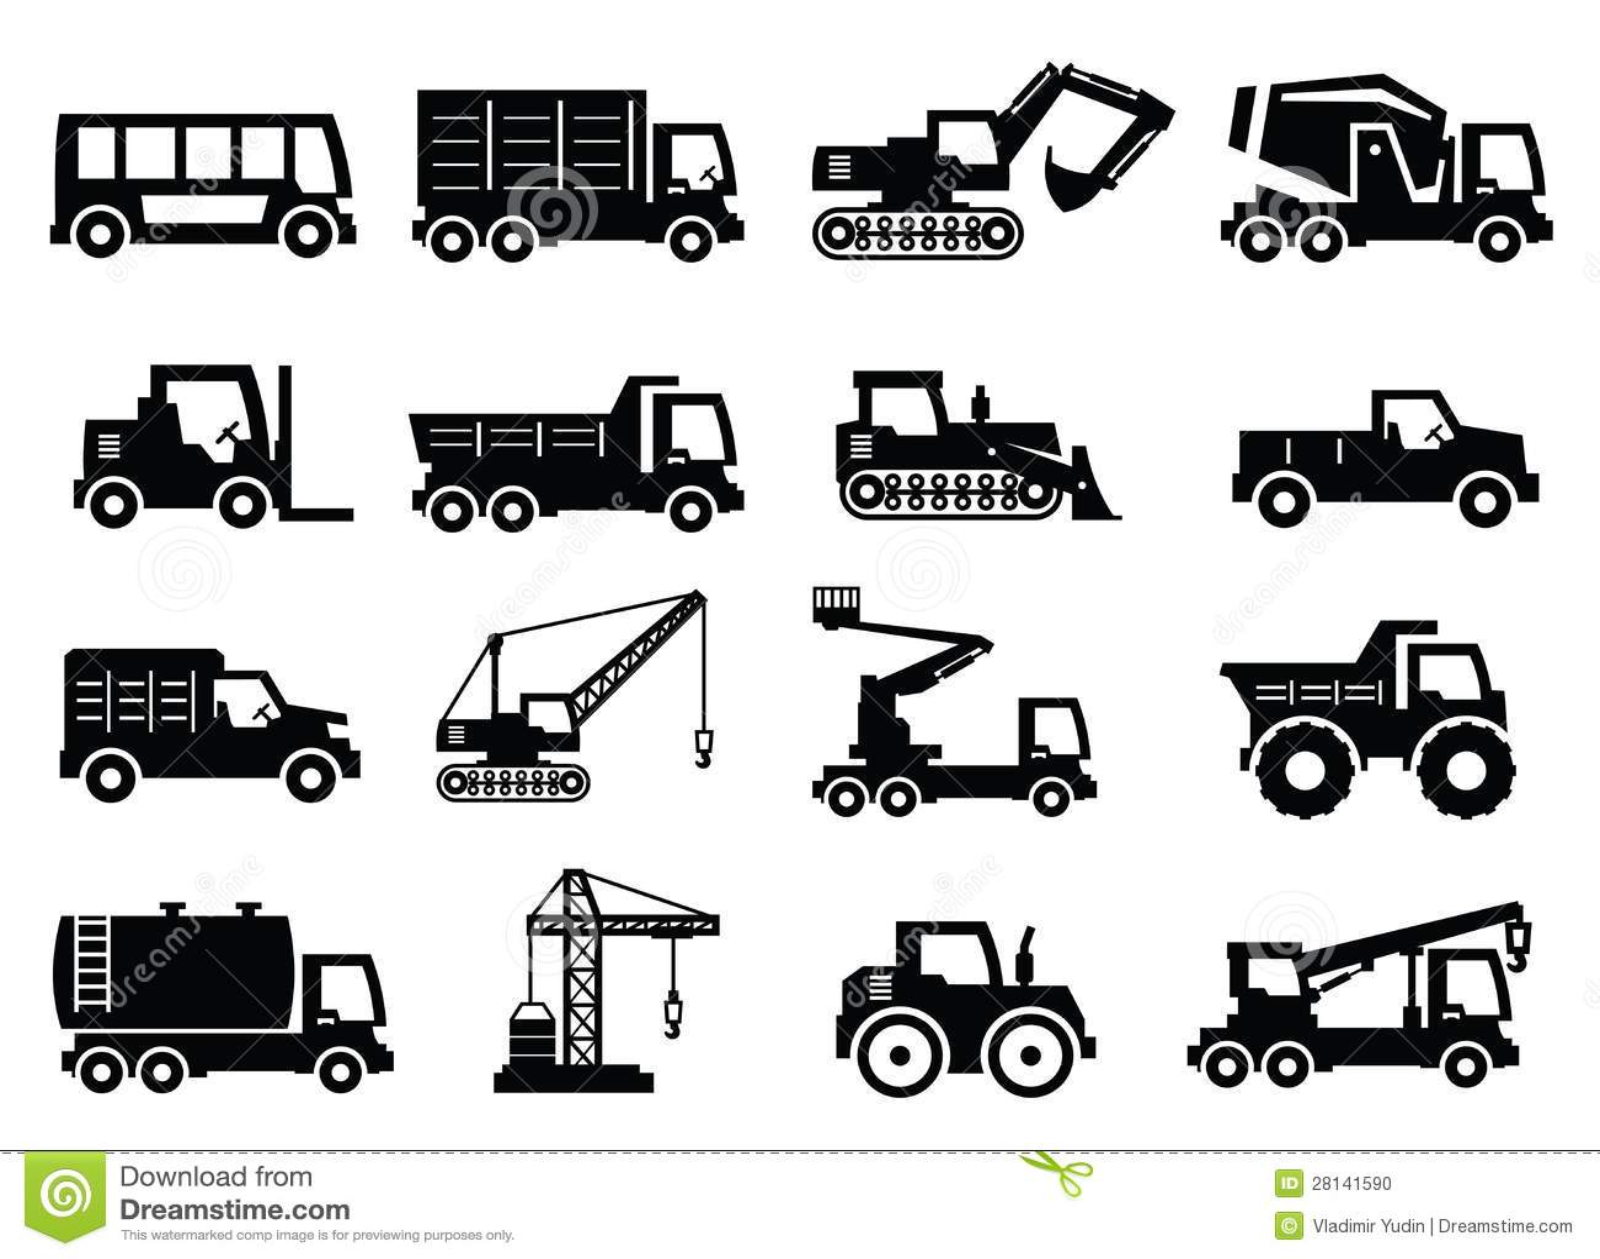 Light Equipment Transport : Transport and construction equipment light gray